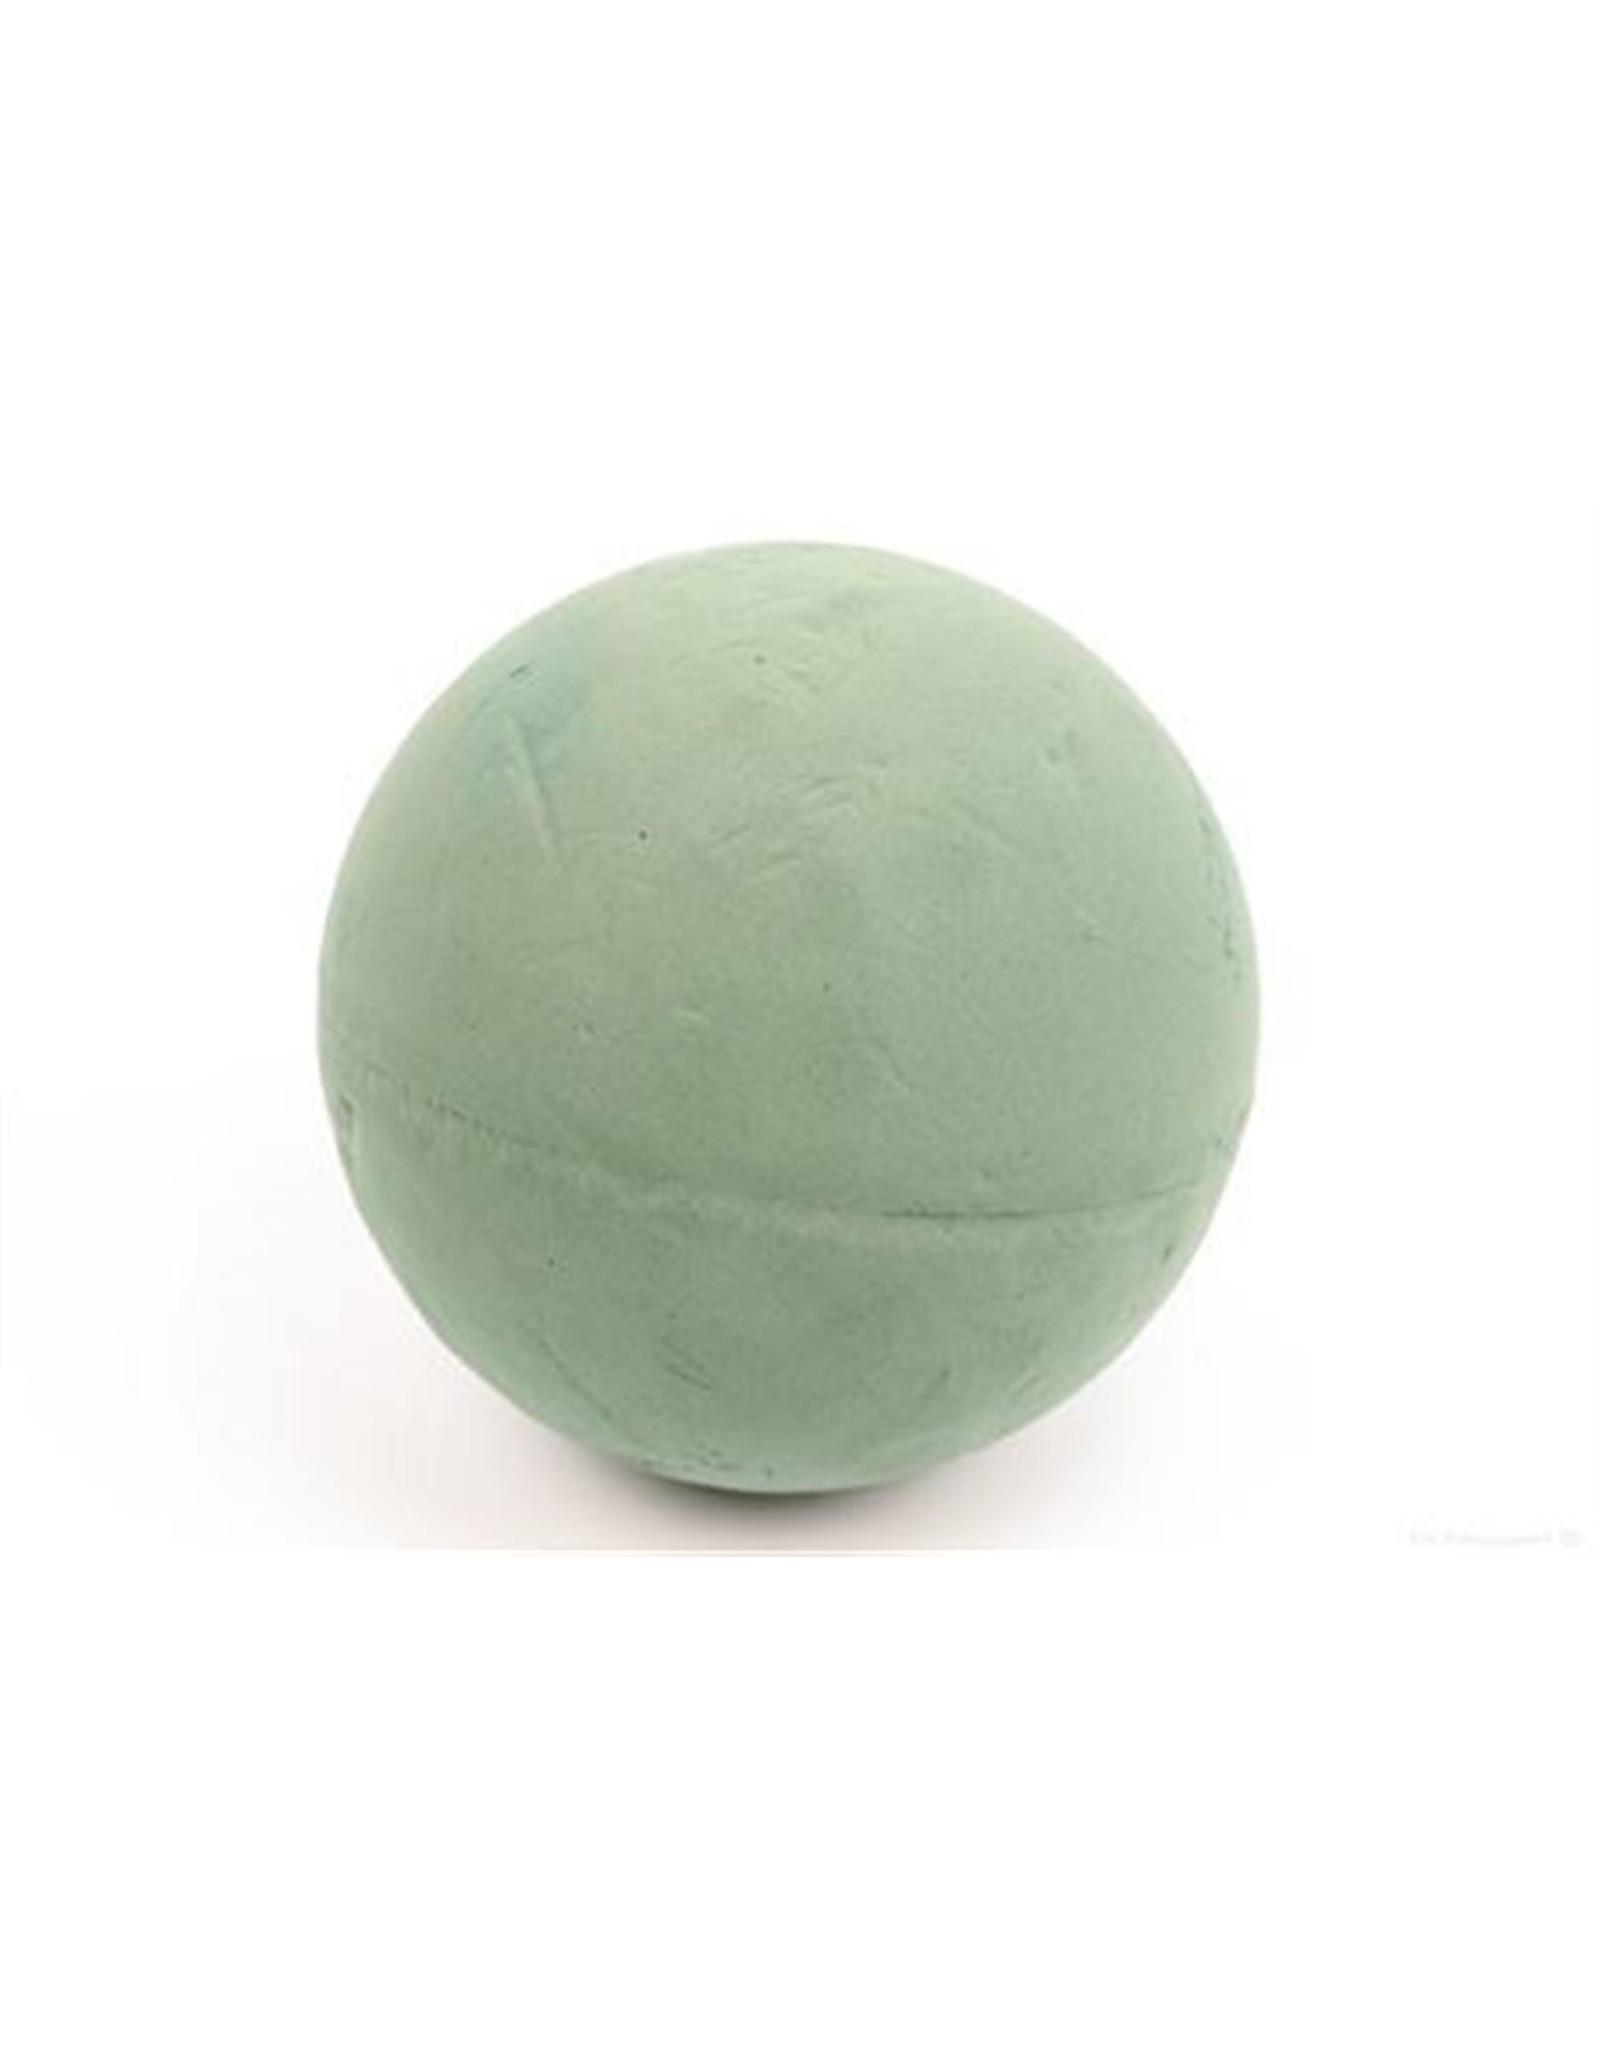 HD Basic Ball Sld Foam D10.0 x 48